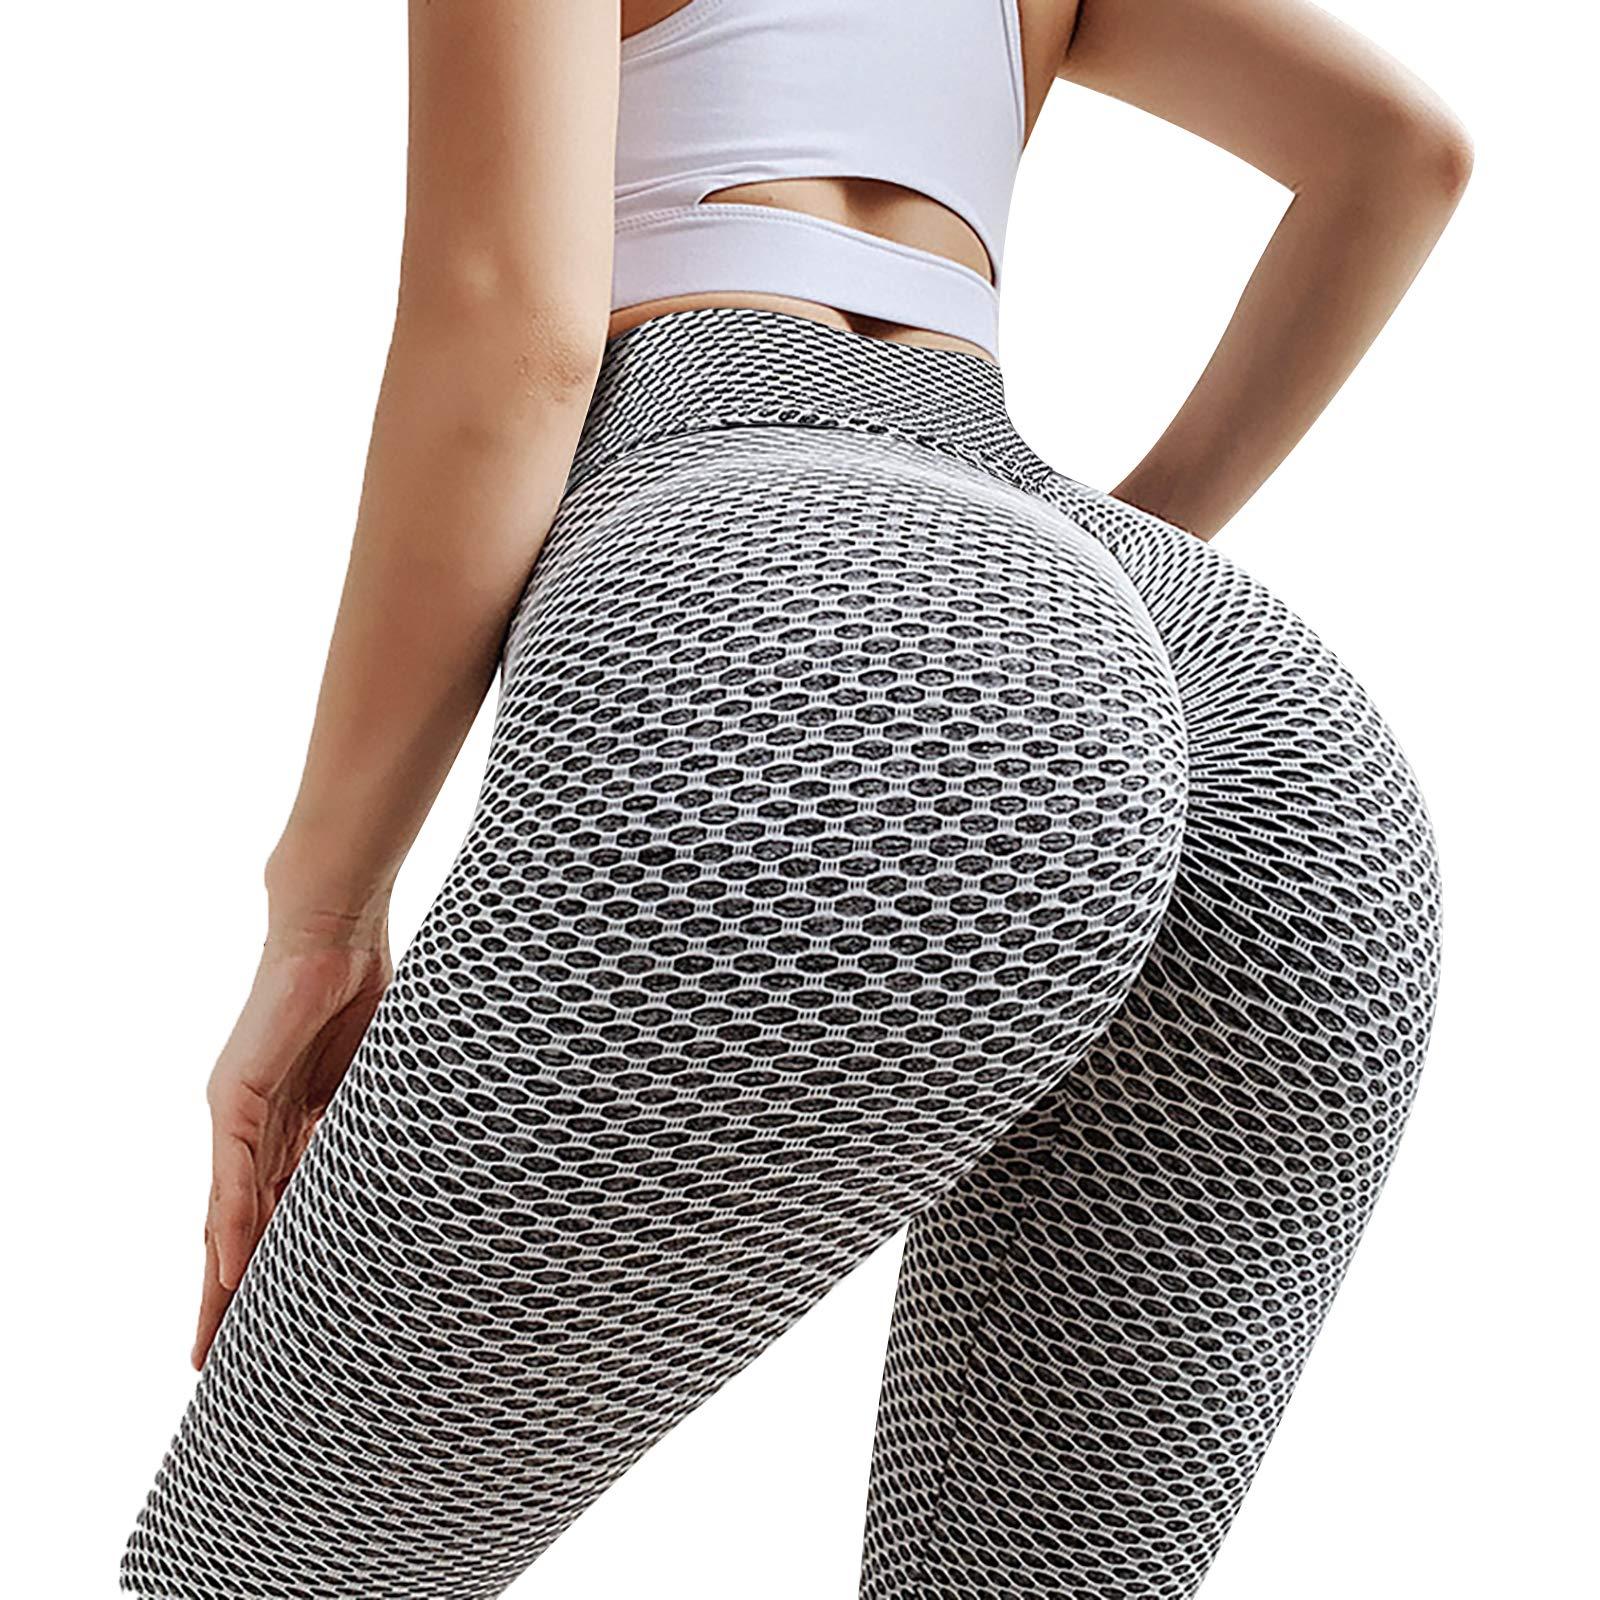 TIK Tok Leggings for Women, High Waisted Butt Lifting Bubble Hip Lift Yoga Pant